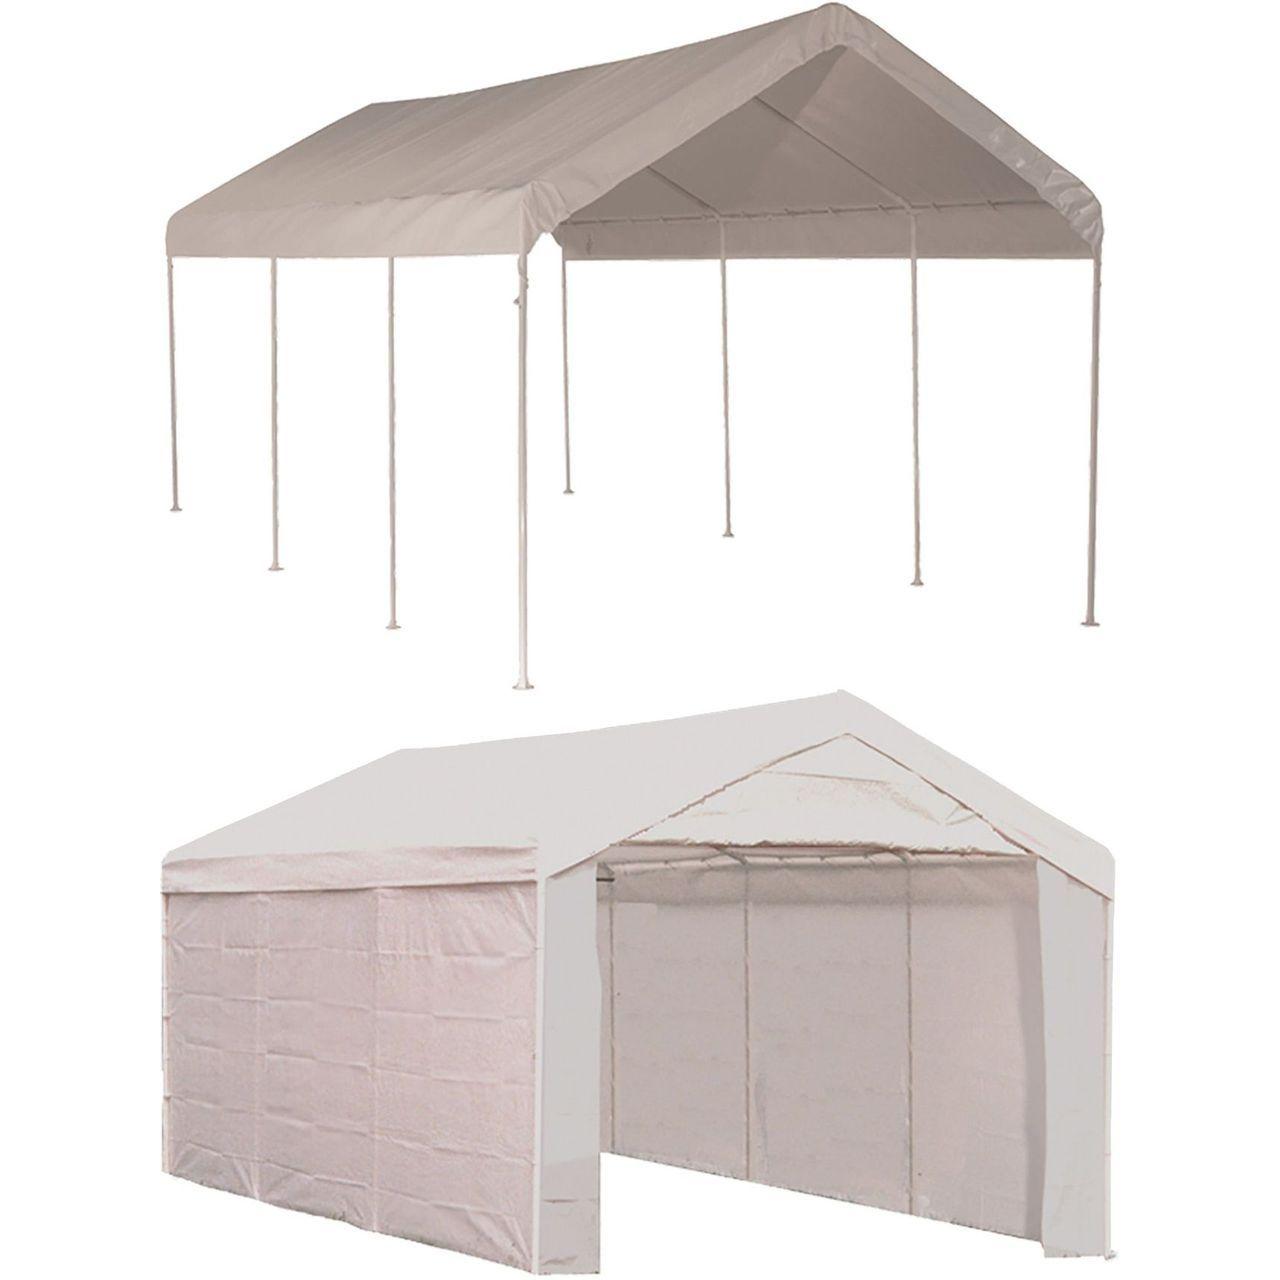 ShelterLogic MaxAP Gazebo Canopy 2-in-1 Enclosure Kit - 10x20 Ft